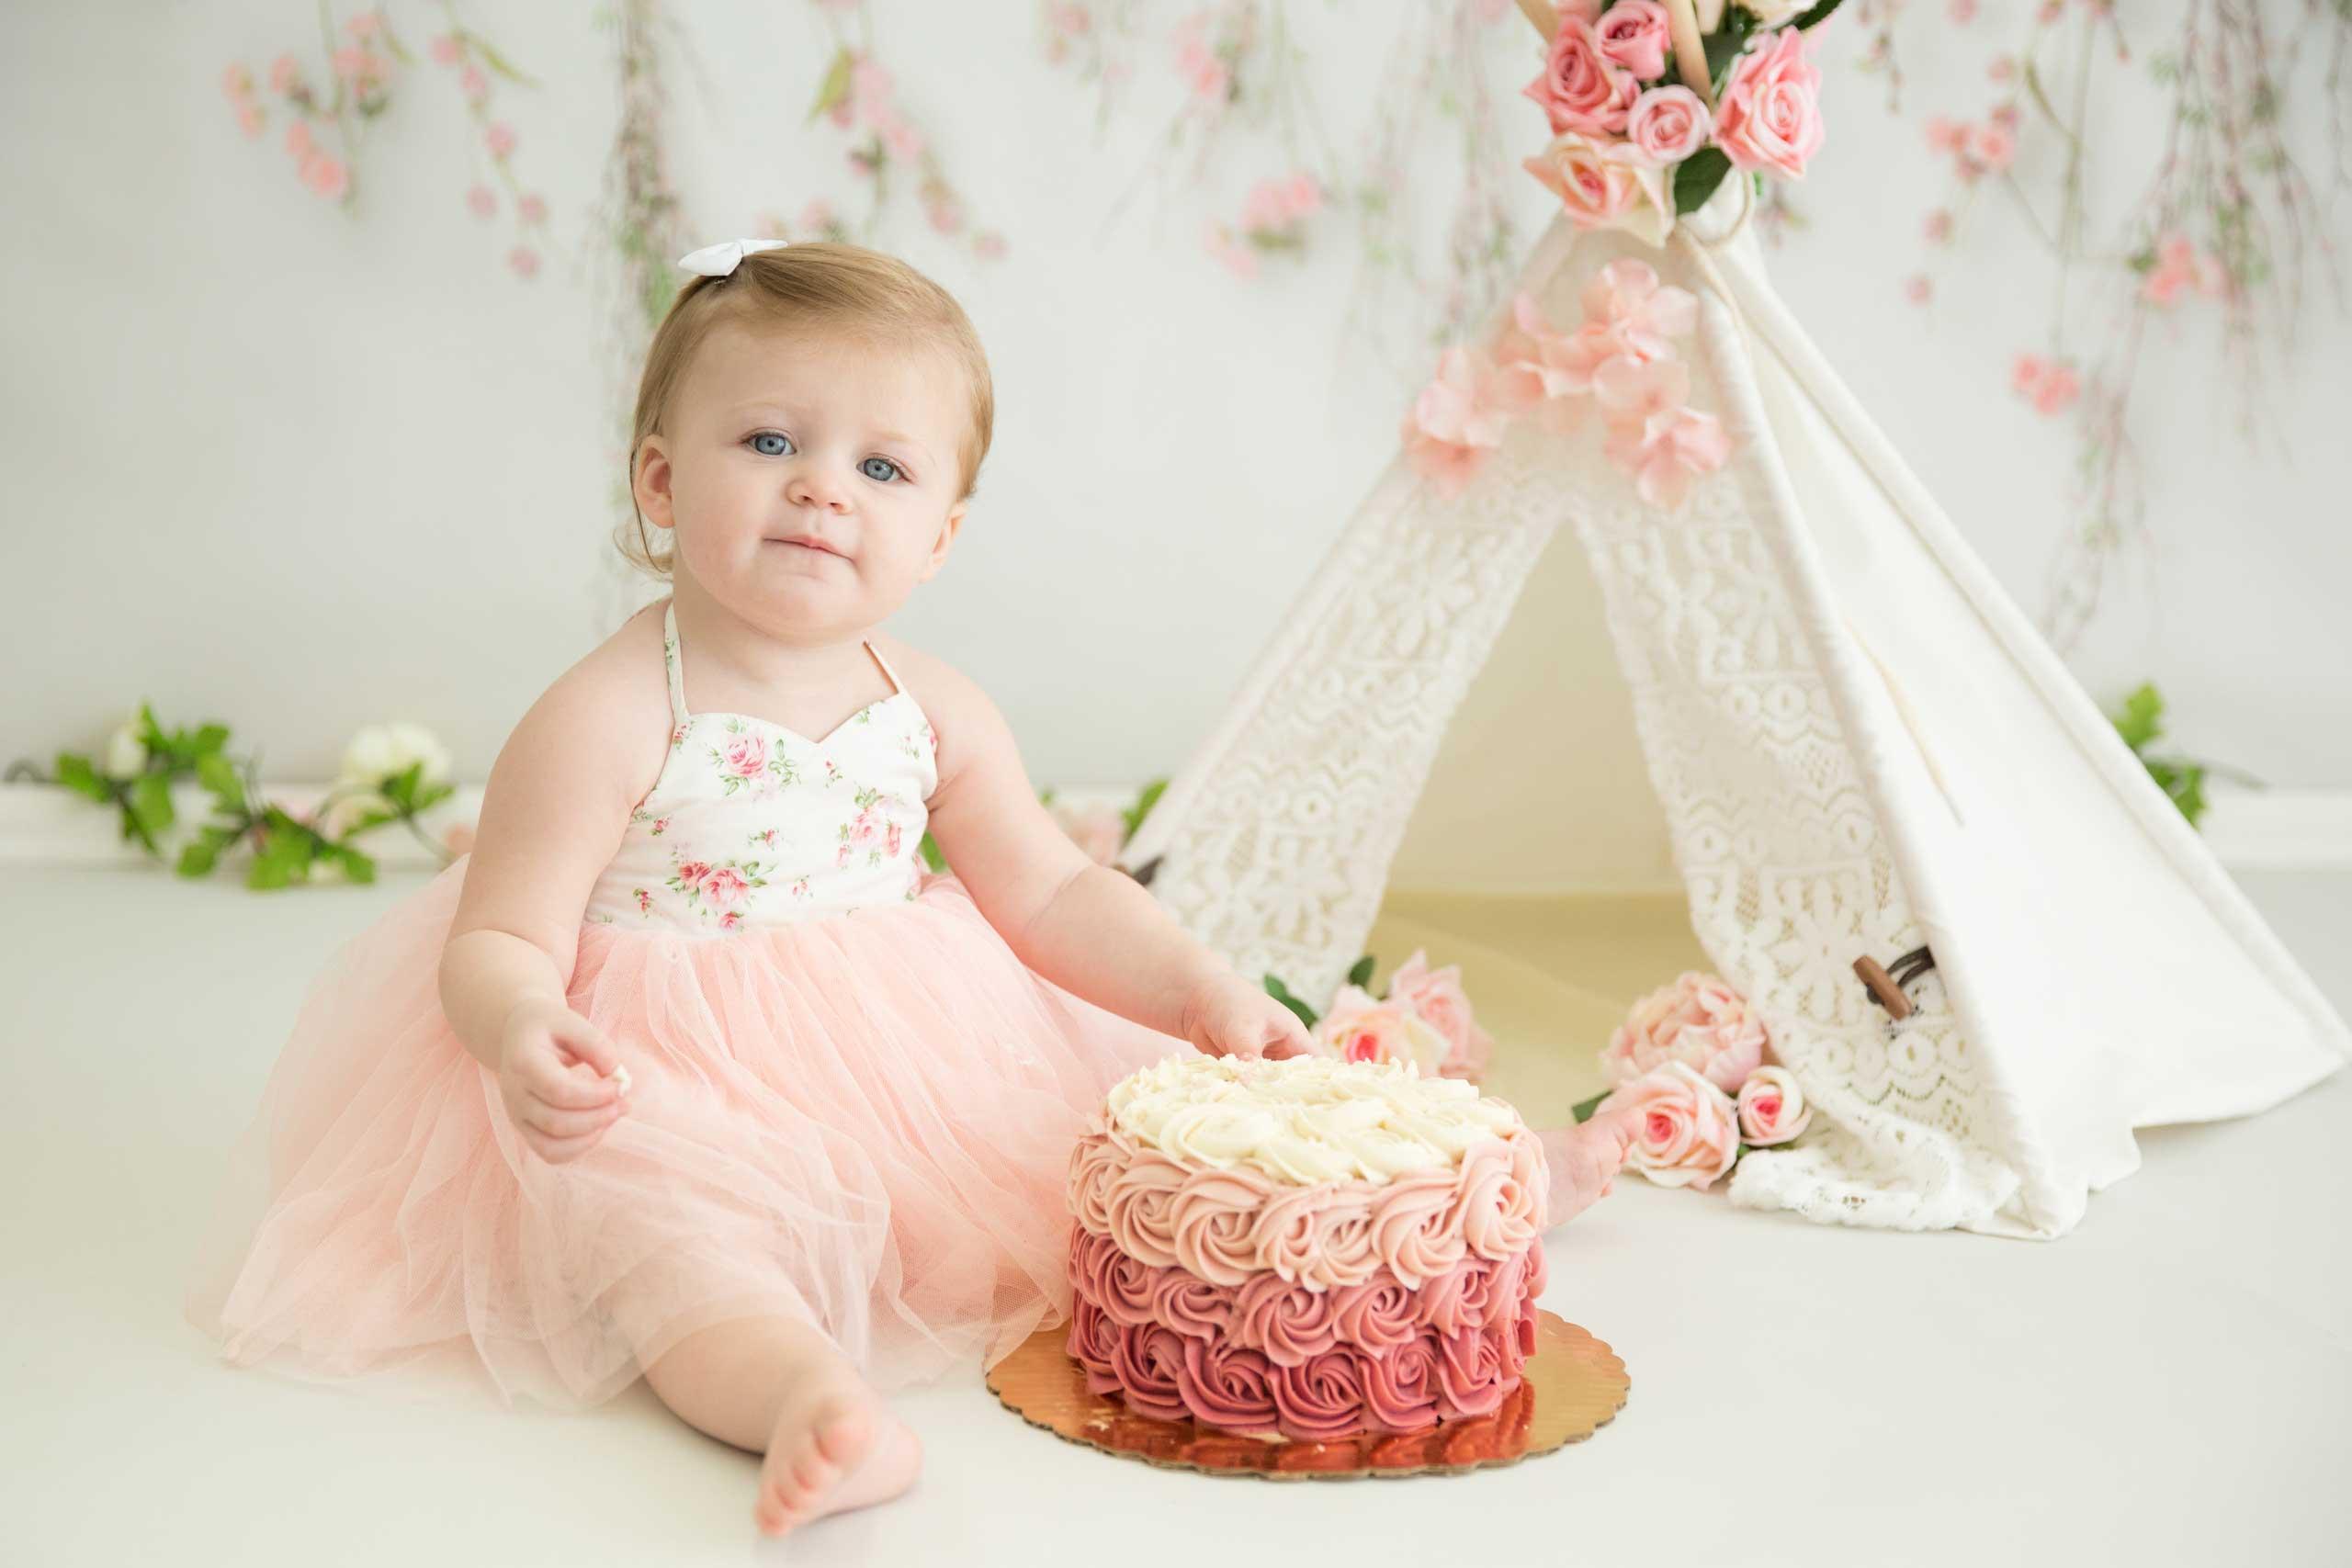 Cake Smash Baby Photographer Los Angeles Ramina Magid